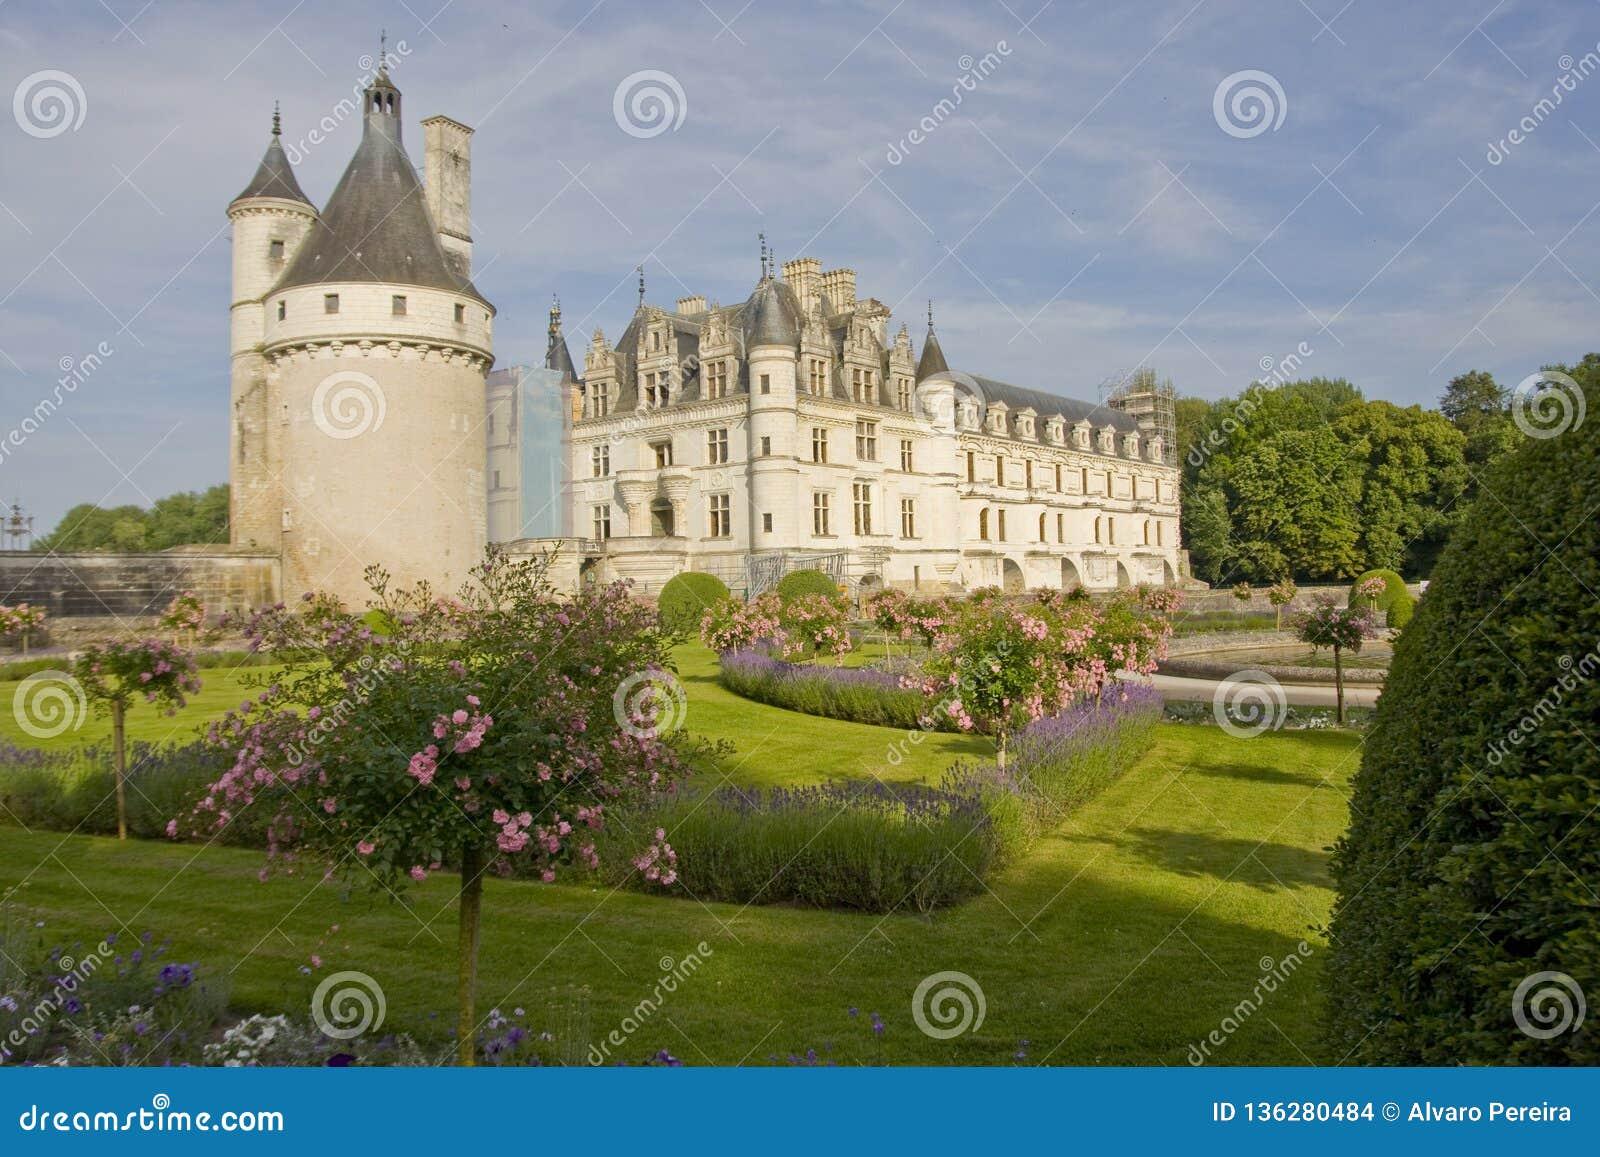 Chateau de Chenonceau i Frankrike